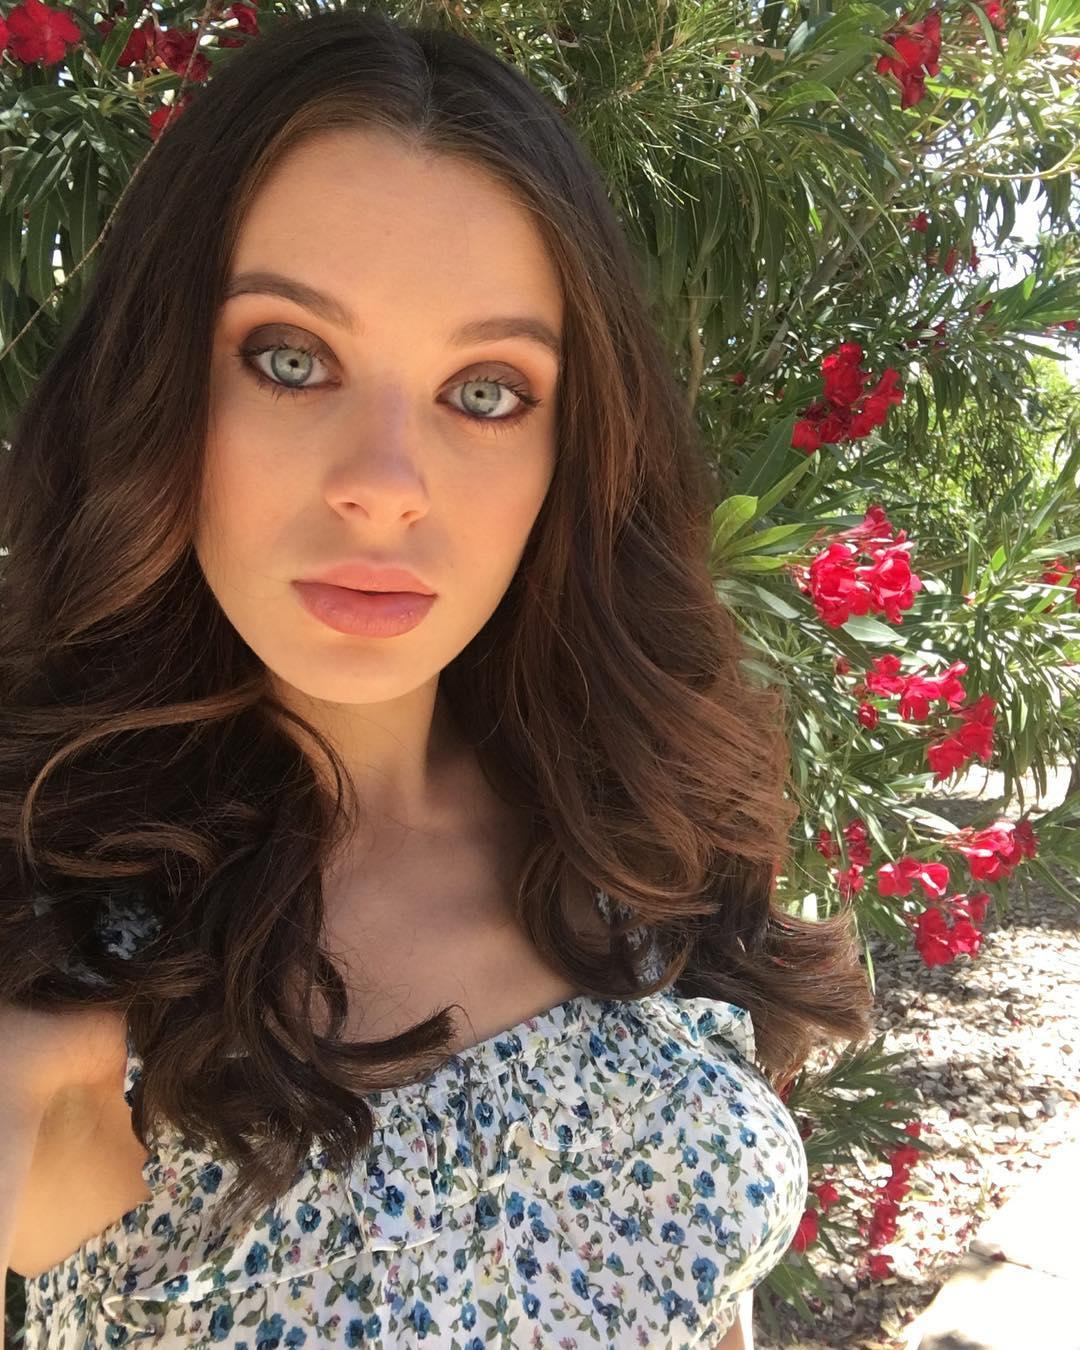 Lana Rhoades Instagram username